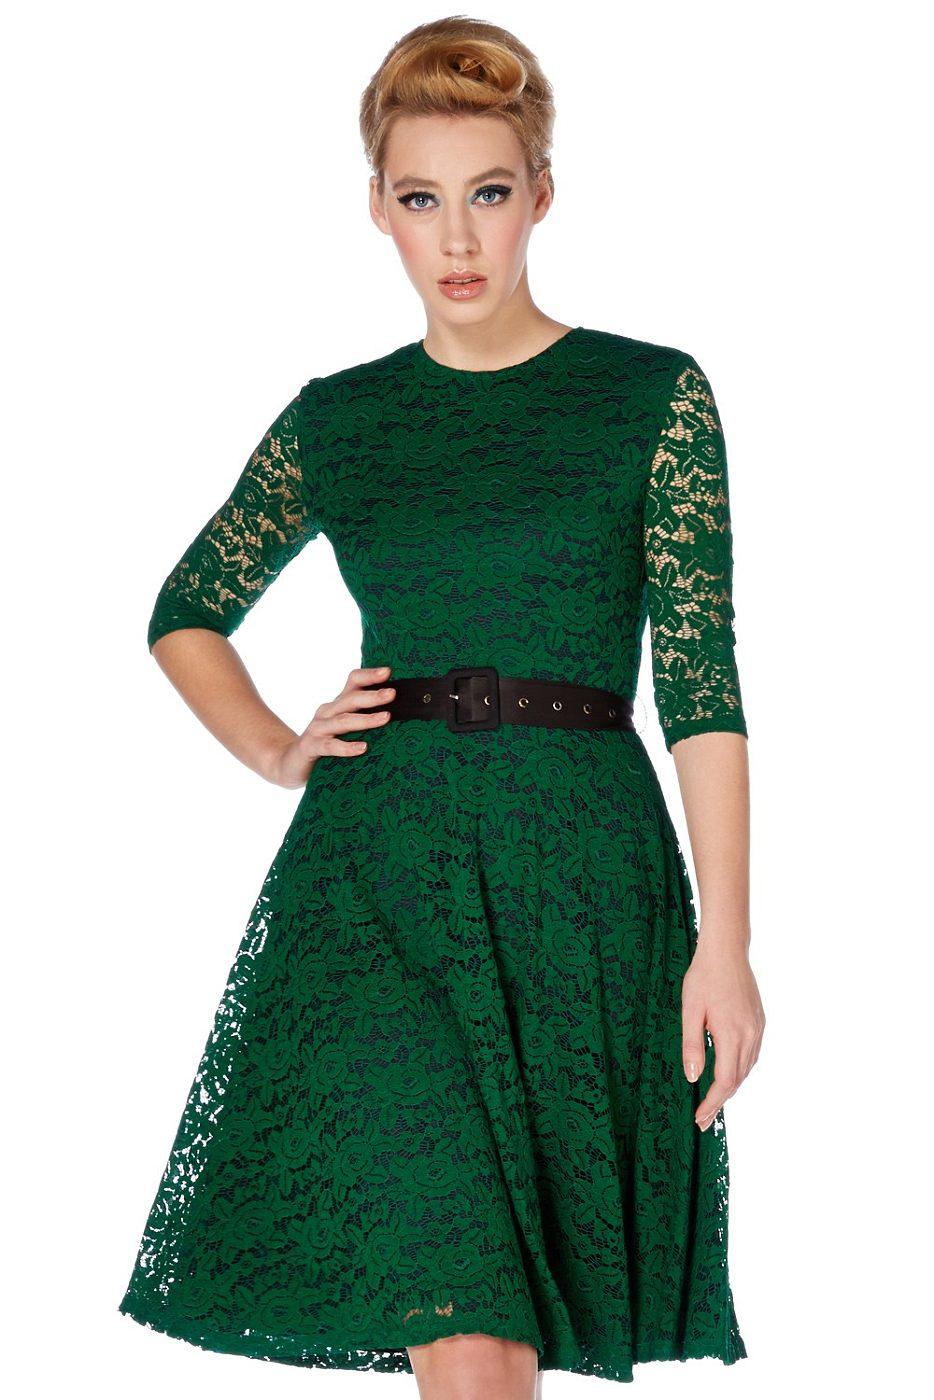 61a7ebf02caa Zelené krajkové šaty Voodoo Vixen Patricia Voodoo Vixen